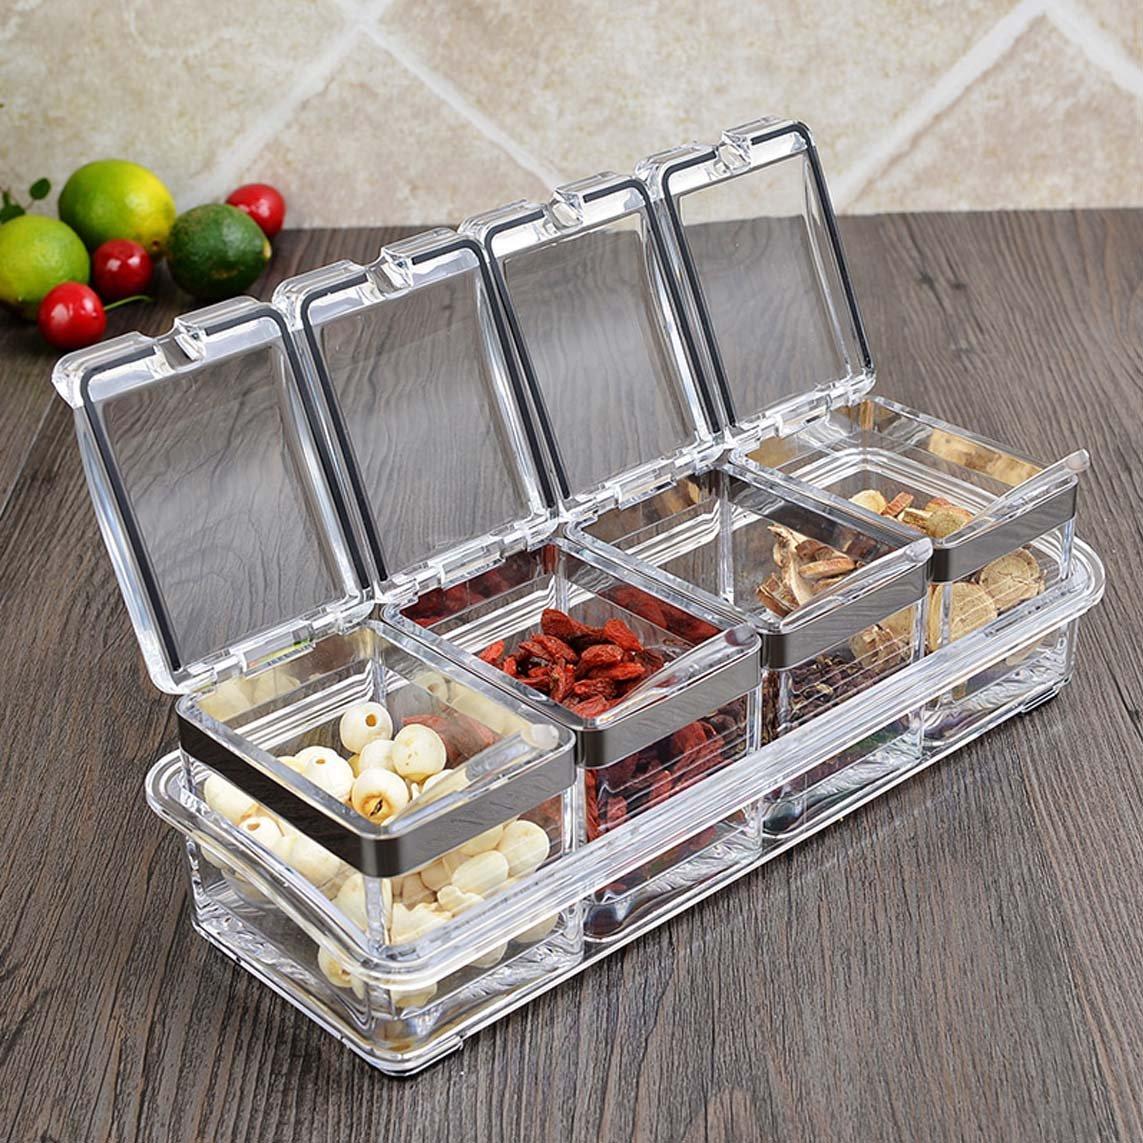 ZFDM Kitchen Supplies European Creative Seasoning Box Seasoning Jar Set Seasoning Bottle Seasoning Box Acrylic Salt Shaker